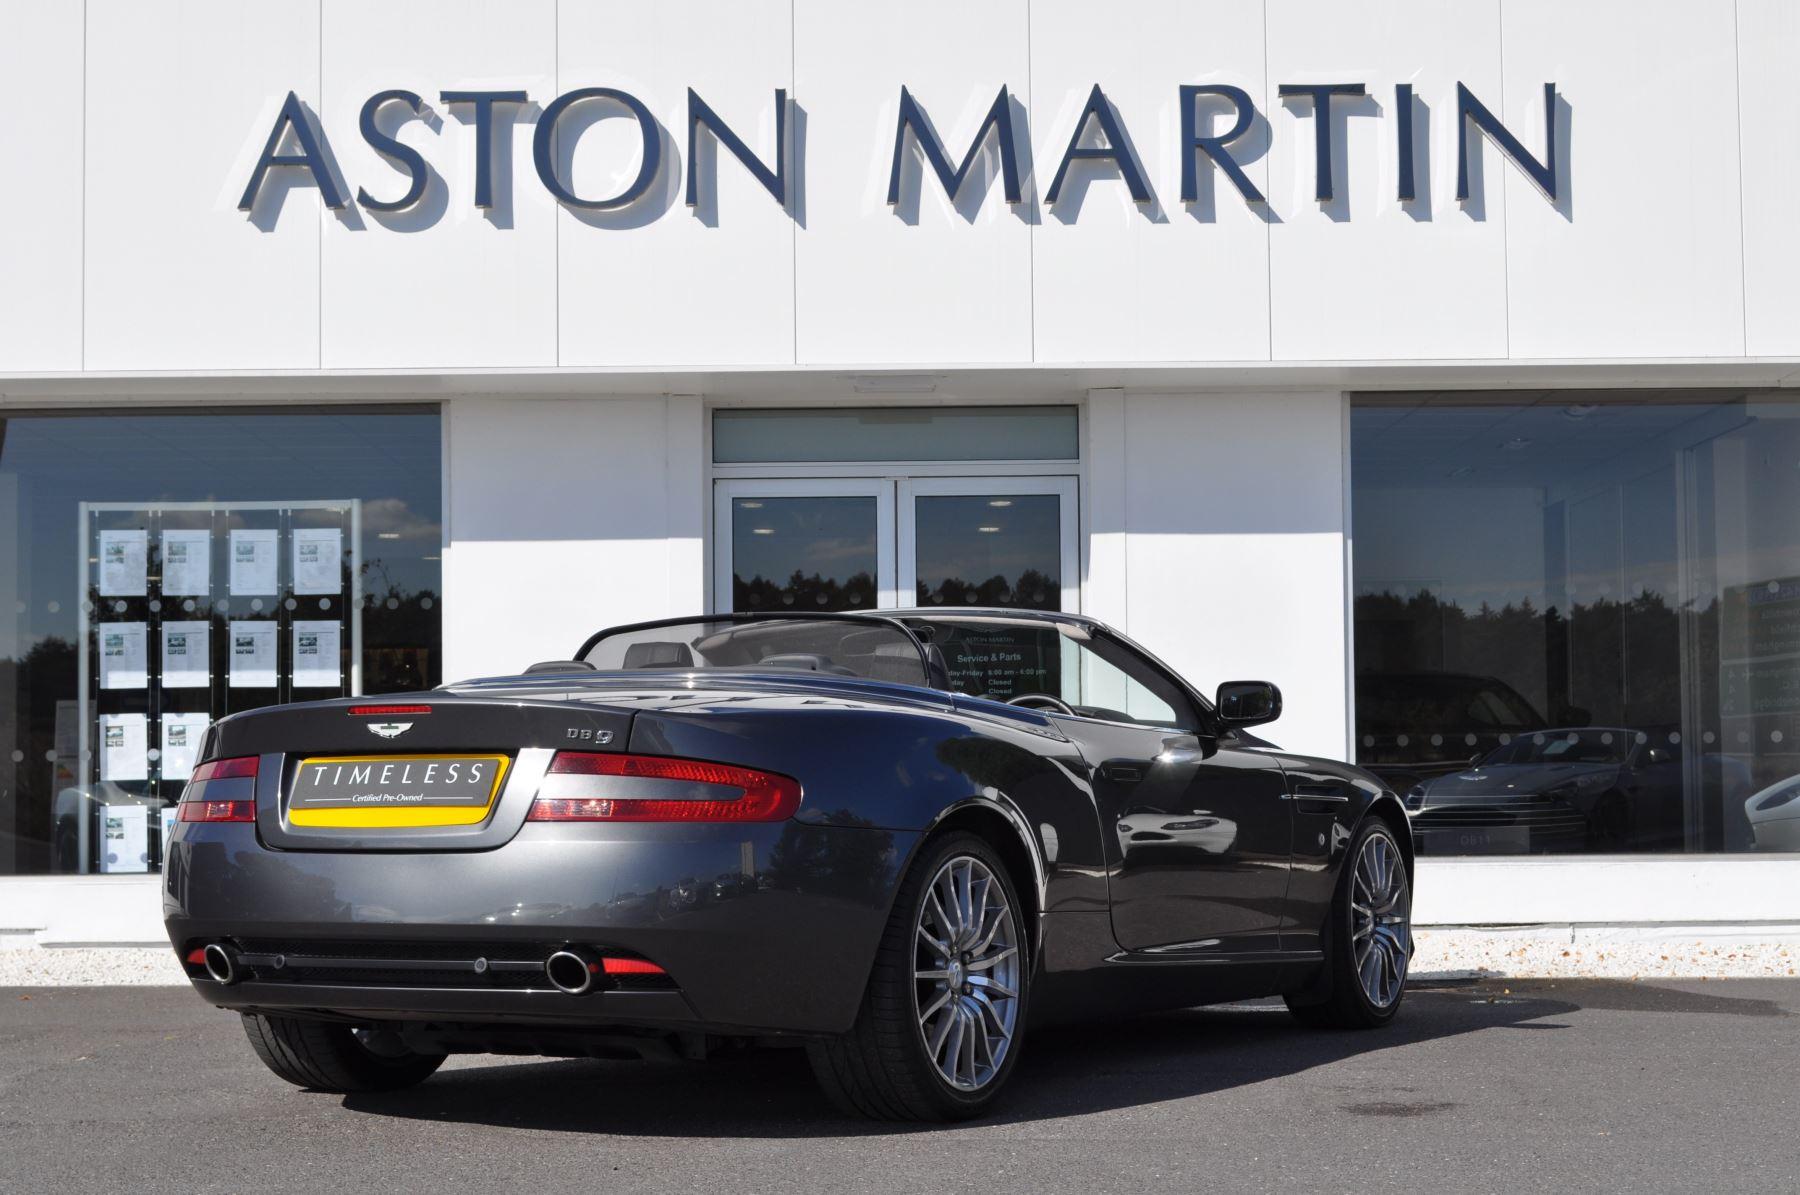 Aston Martin DB V Dr Volante Touchtronic Automatic - Aston martin db9